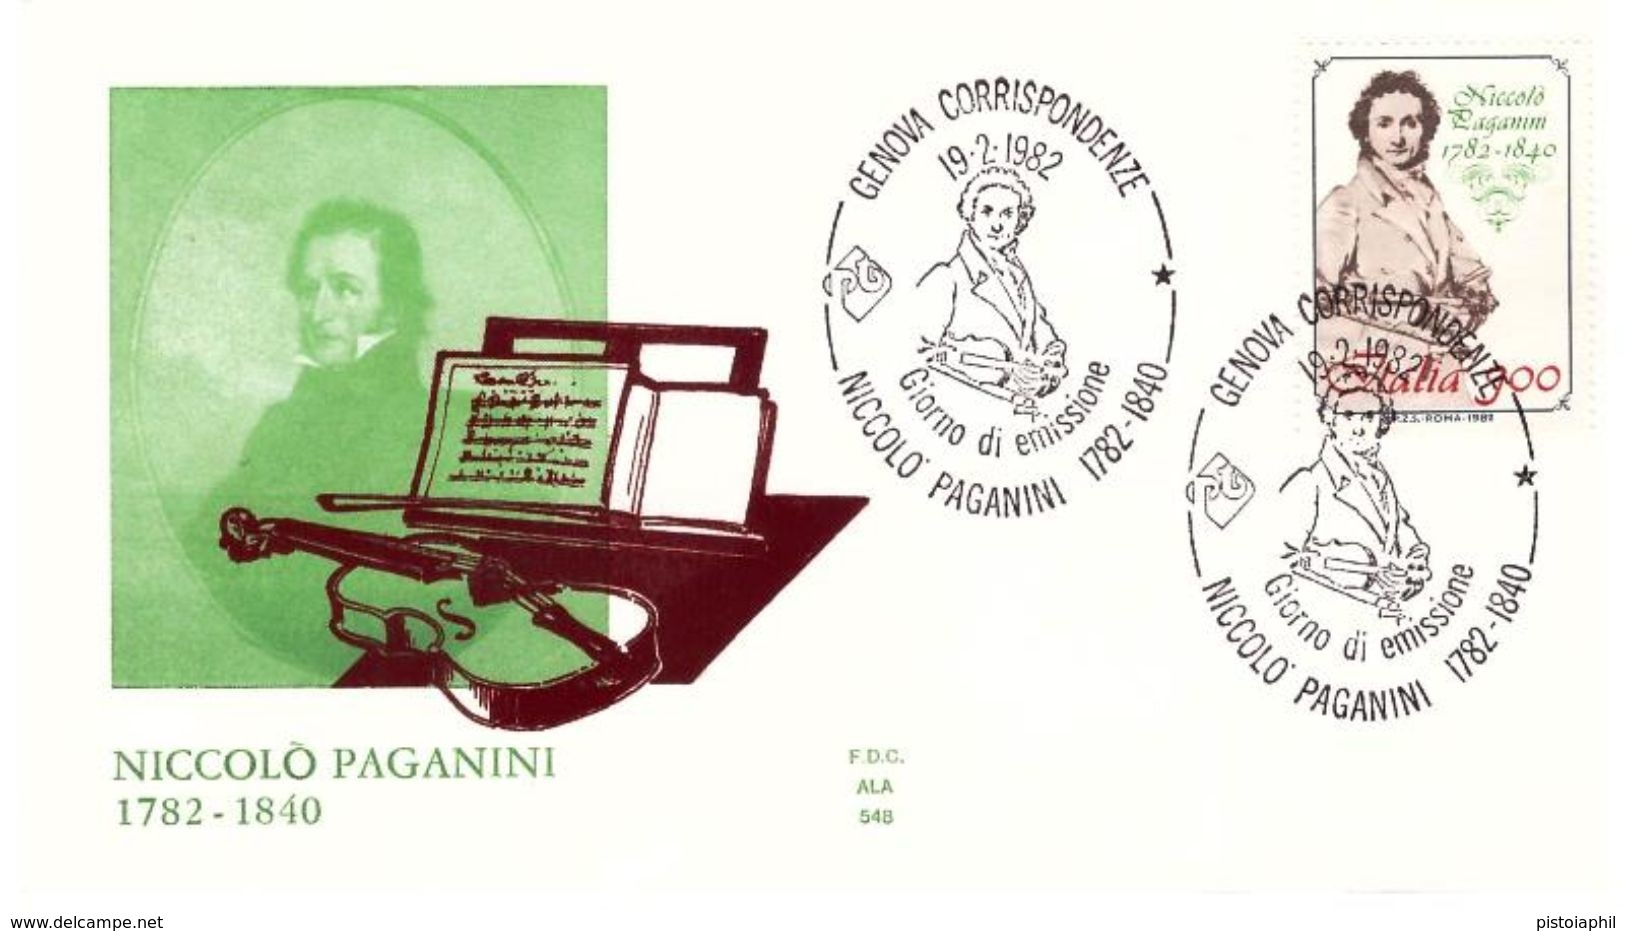 Fdc Ala: PAGANINI 1982, No Viaggiata, AS - F.D.C.